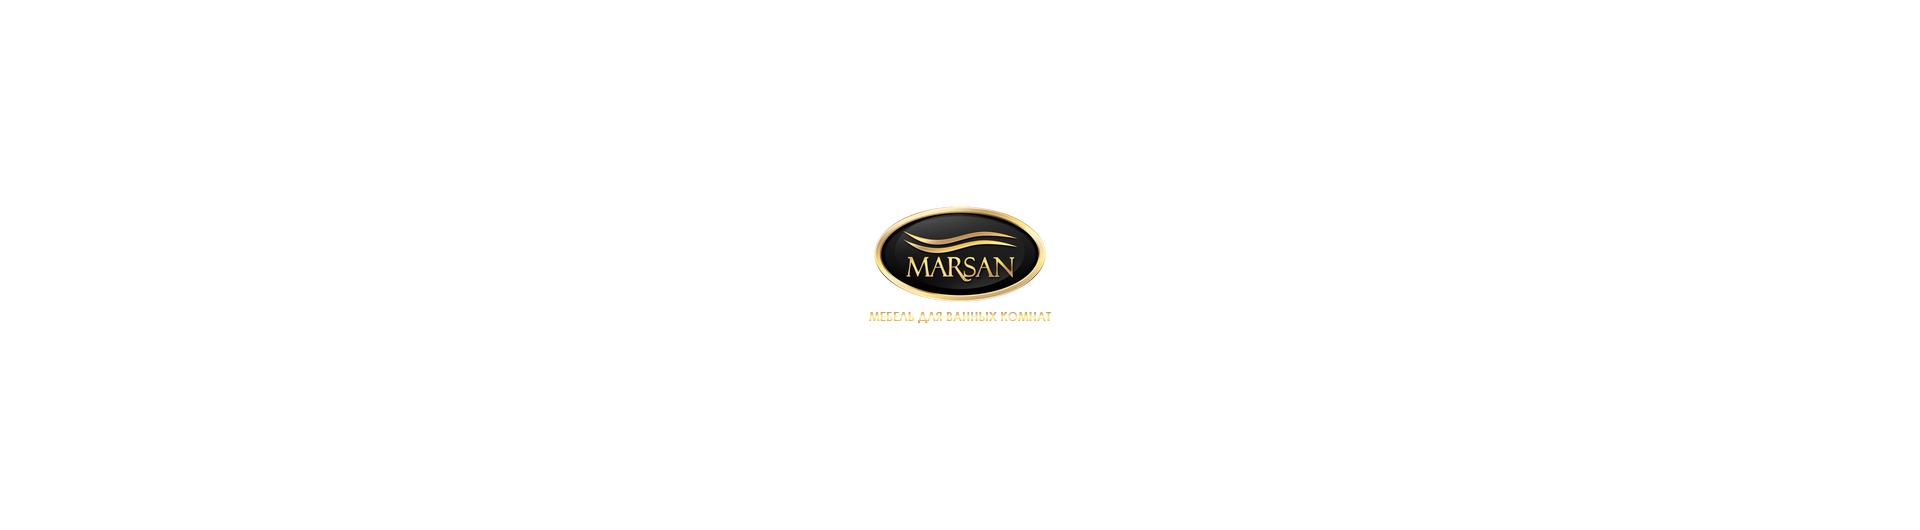 Мебель Marsan